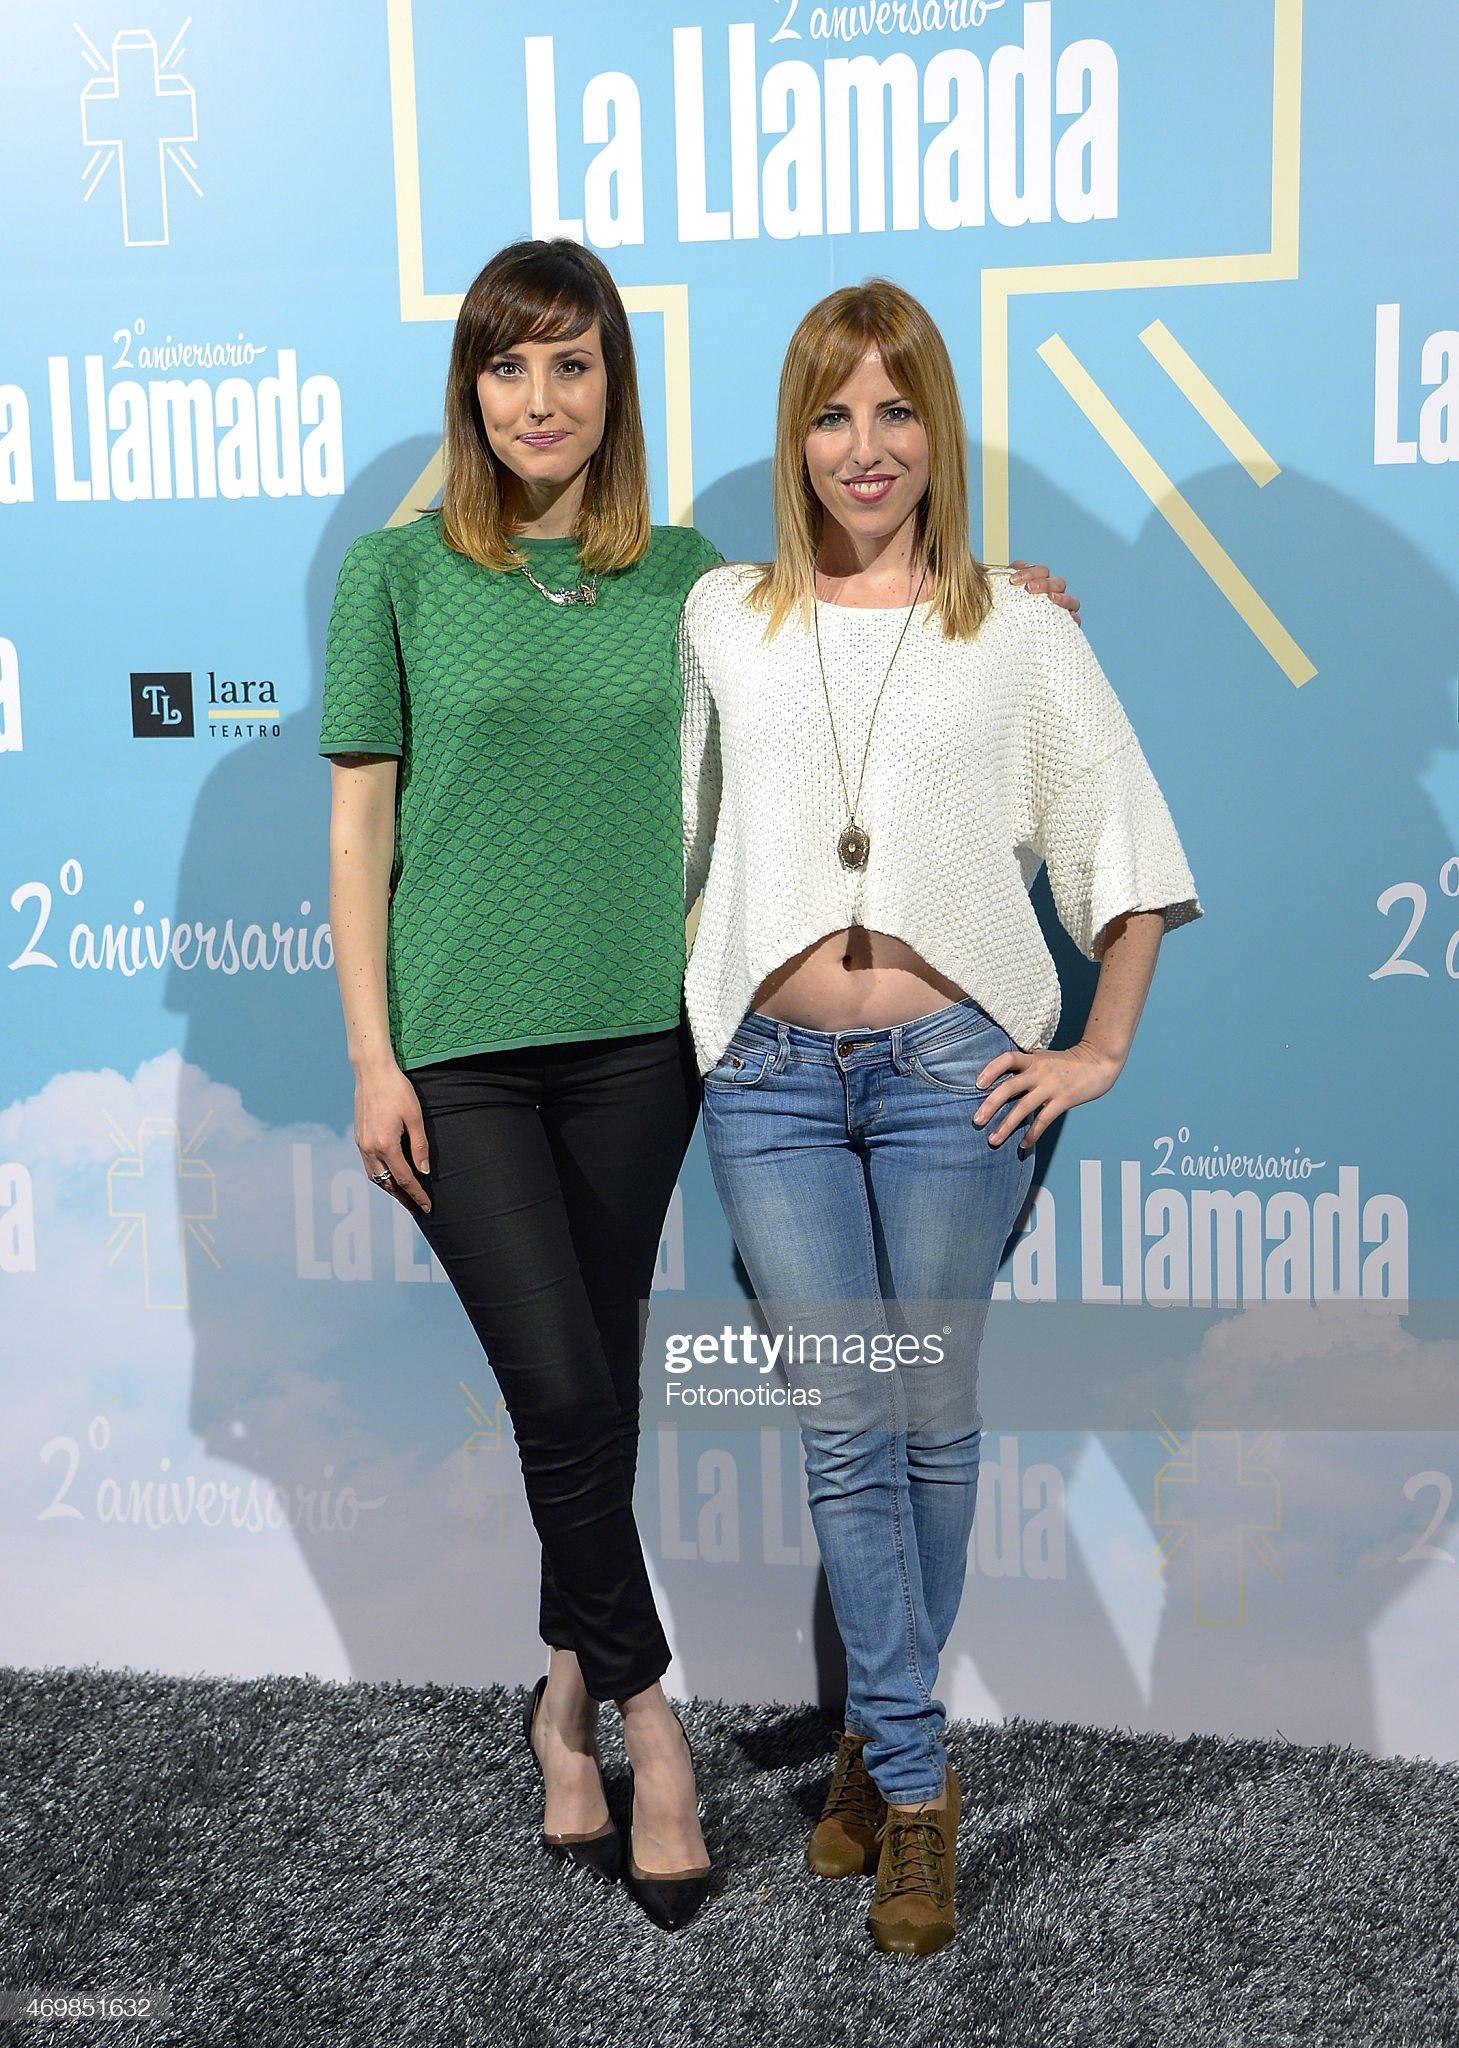 ¿Cuánto mide Celia de Molina? - Altura Natalia-de-molina-and-celia-de-molina-attend-la-llamada-premiere-at-picture-id469851632?s=2048x2048